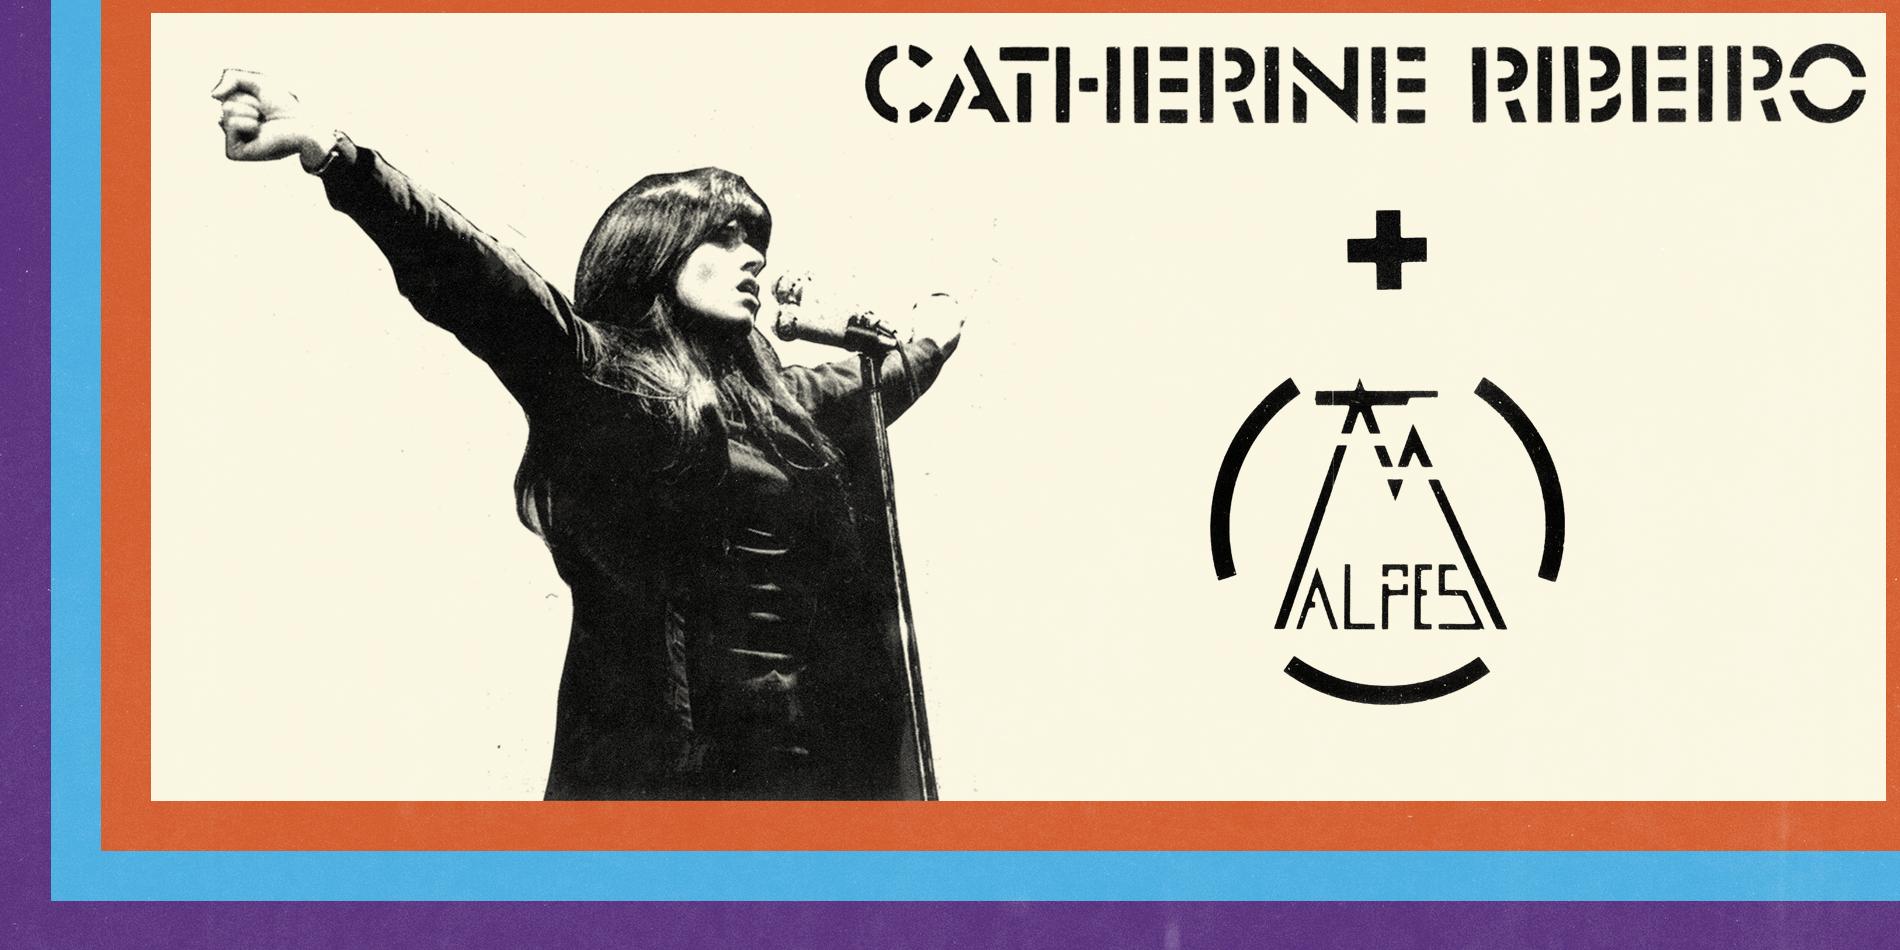 Catherine Ribeiro + Alpes - Vinyl Reissue Announce Image